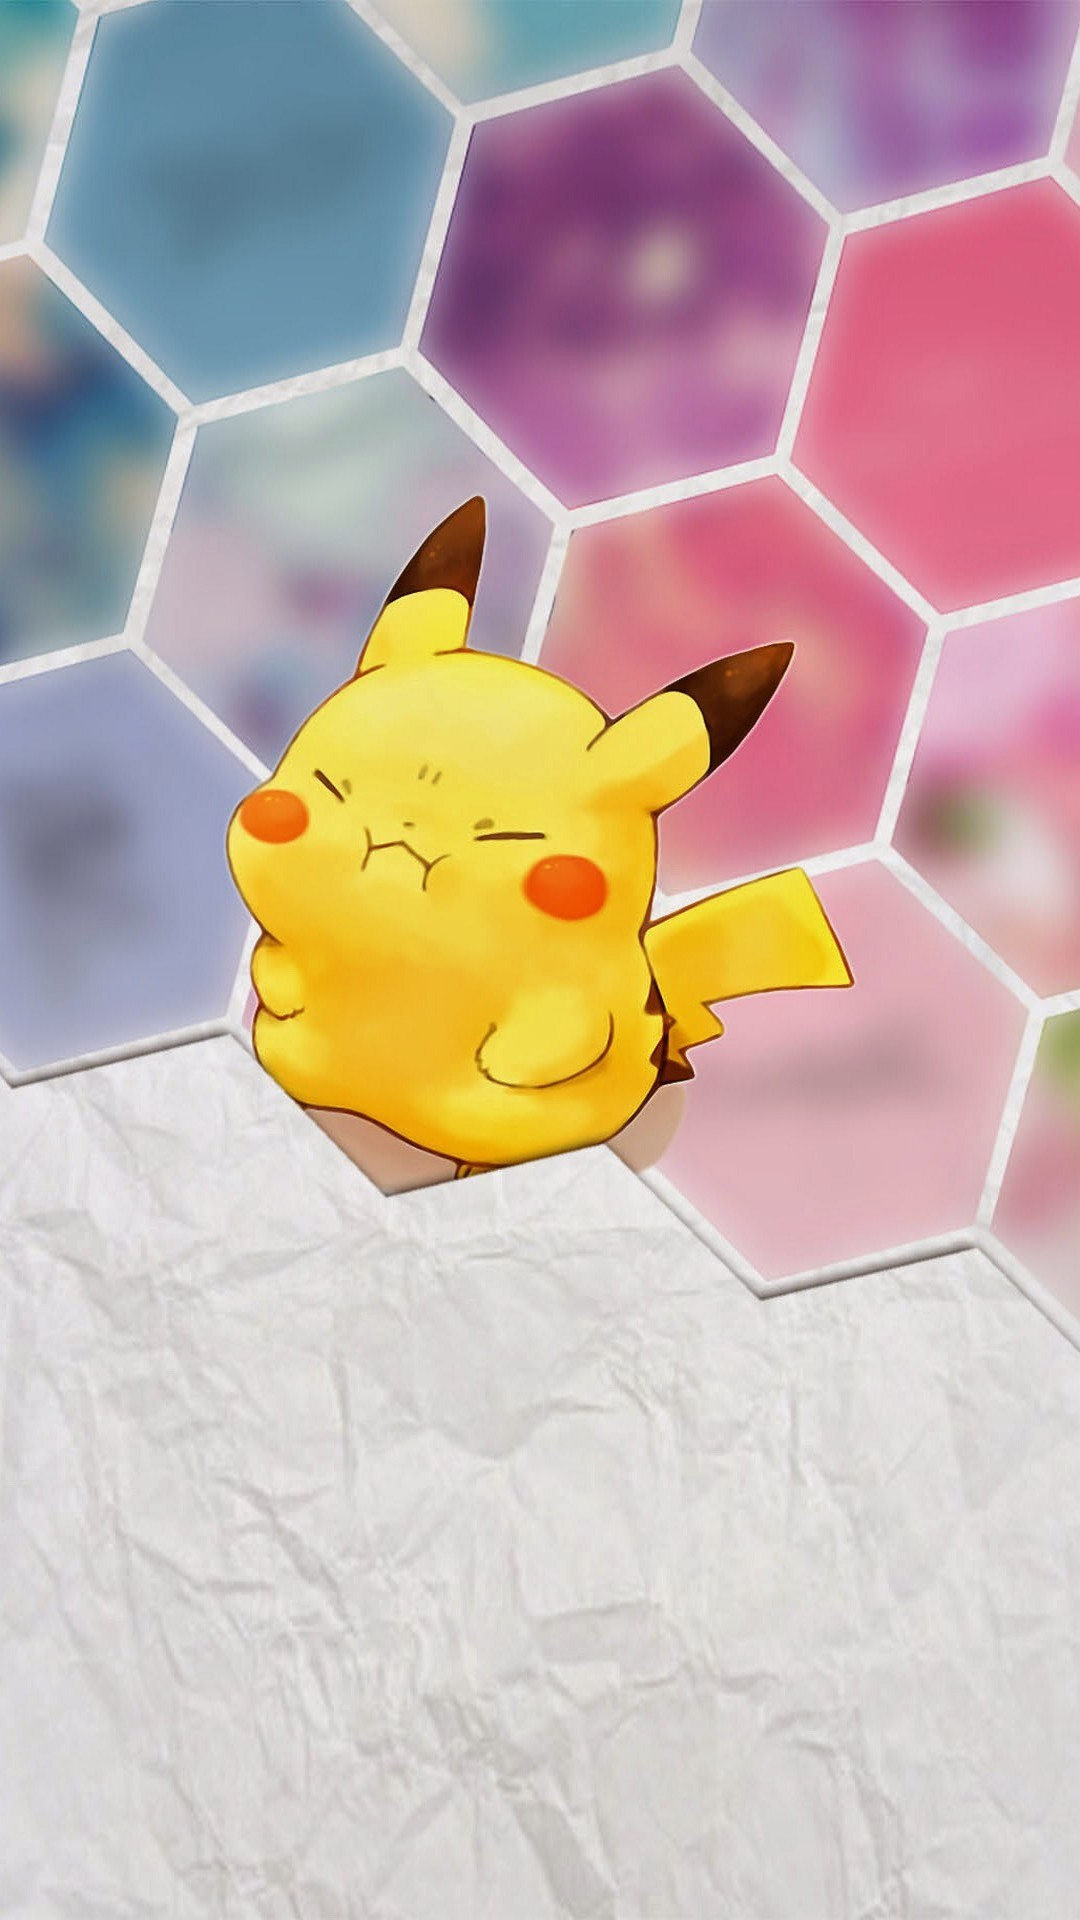 Pikachu backgrounds 72 images - Image pikachu ...